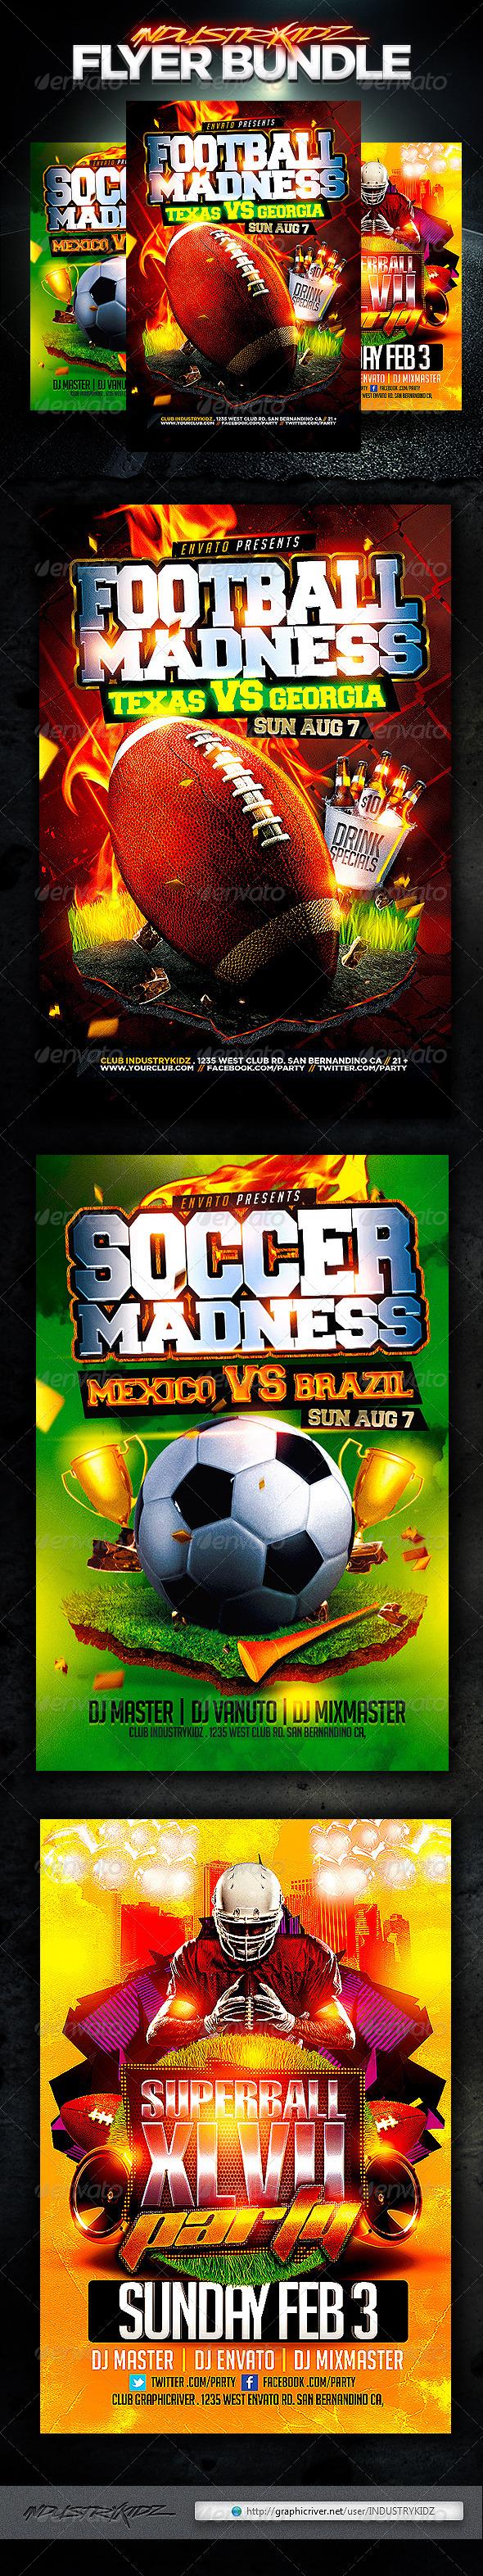 Sport Flyer Template Bundle v2 - Sports Events